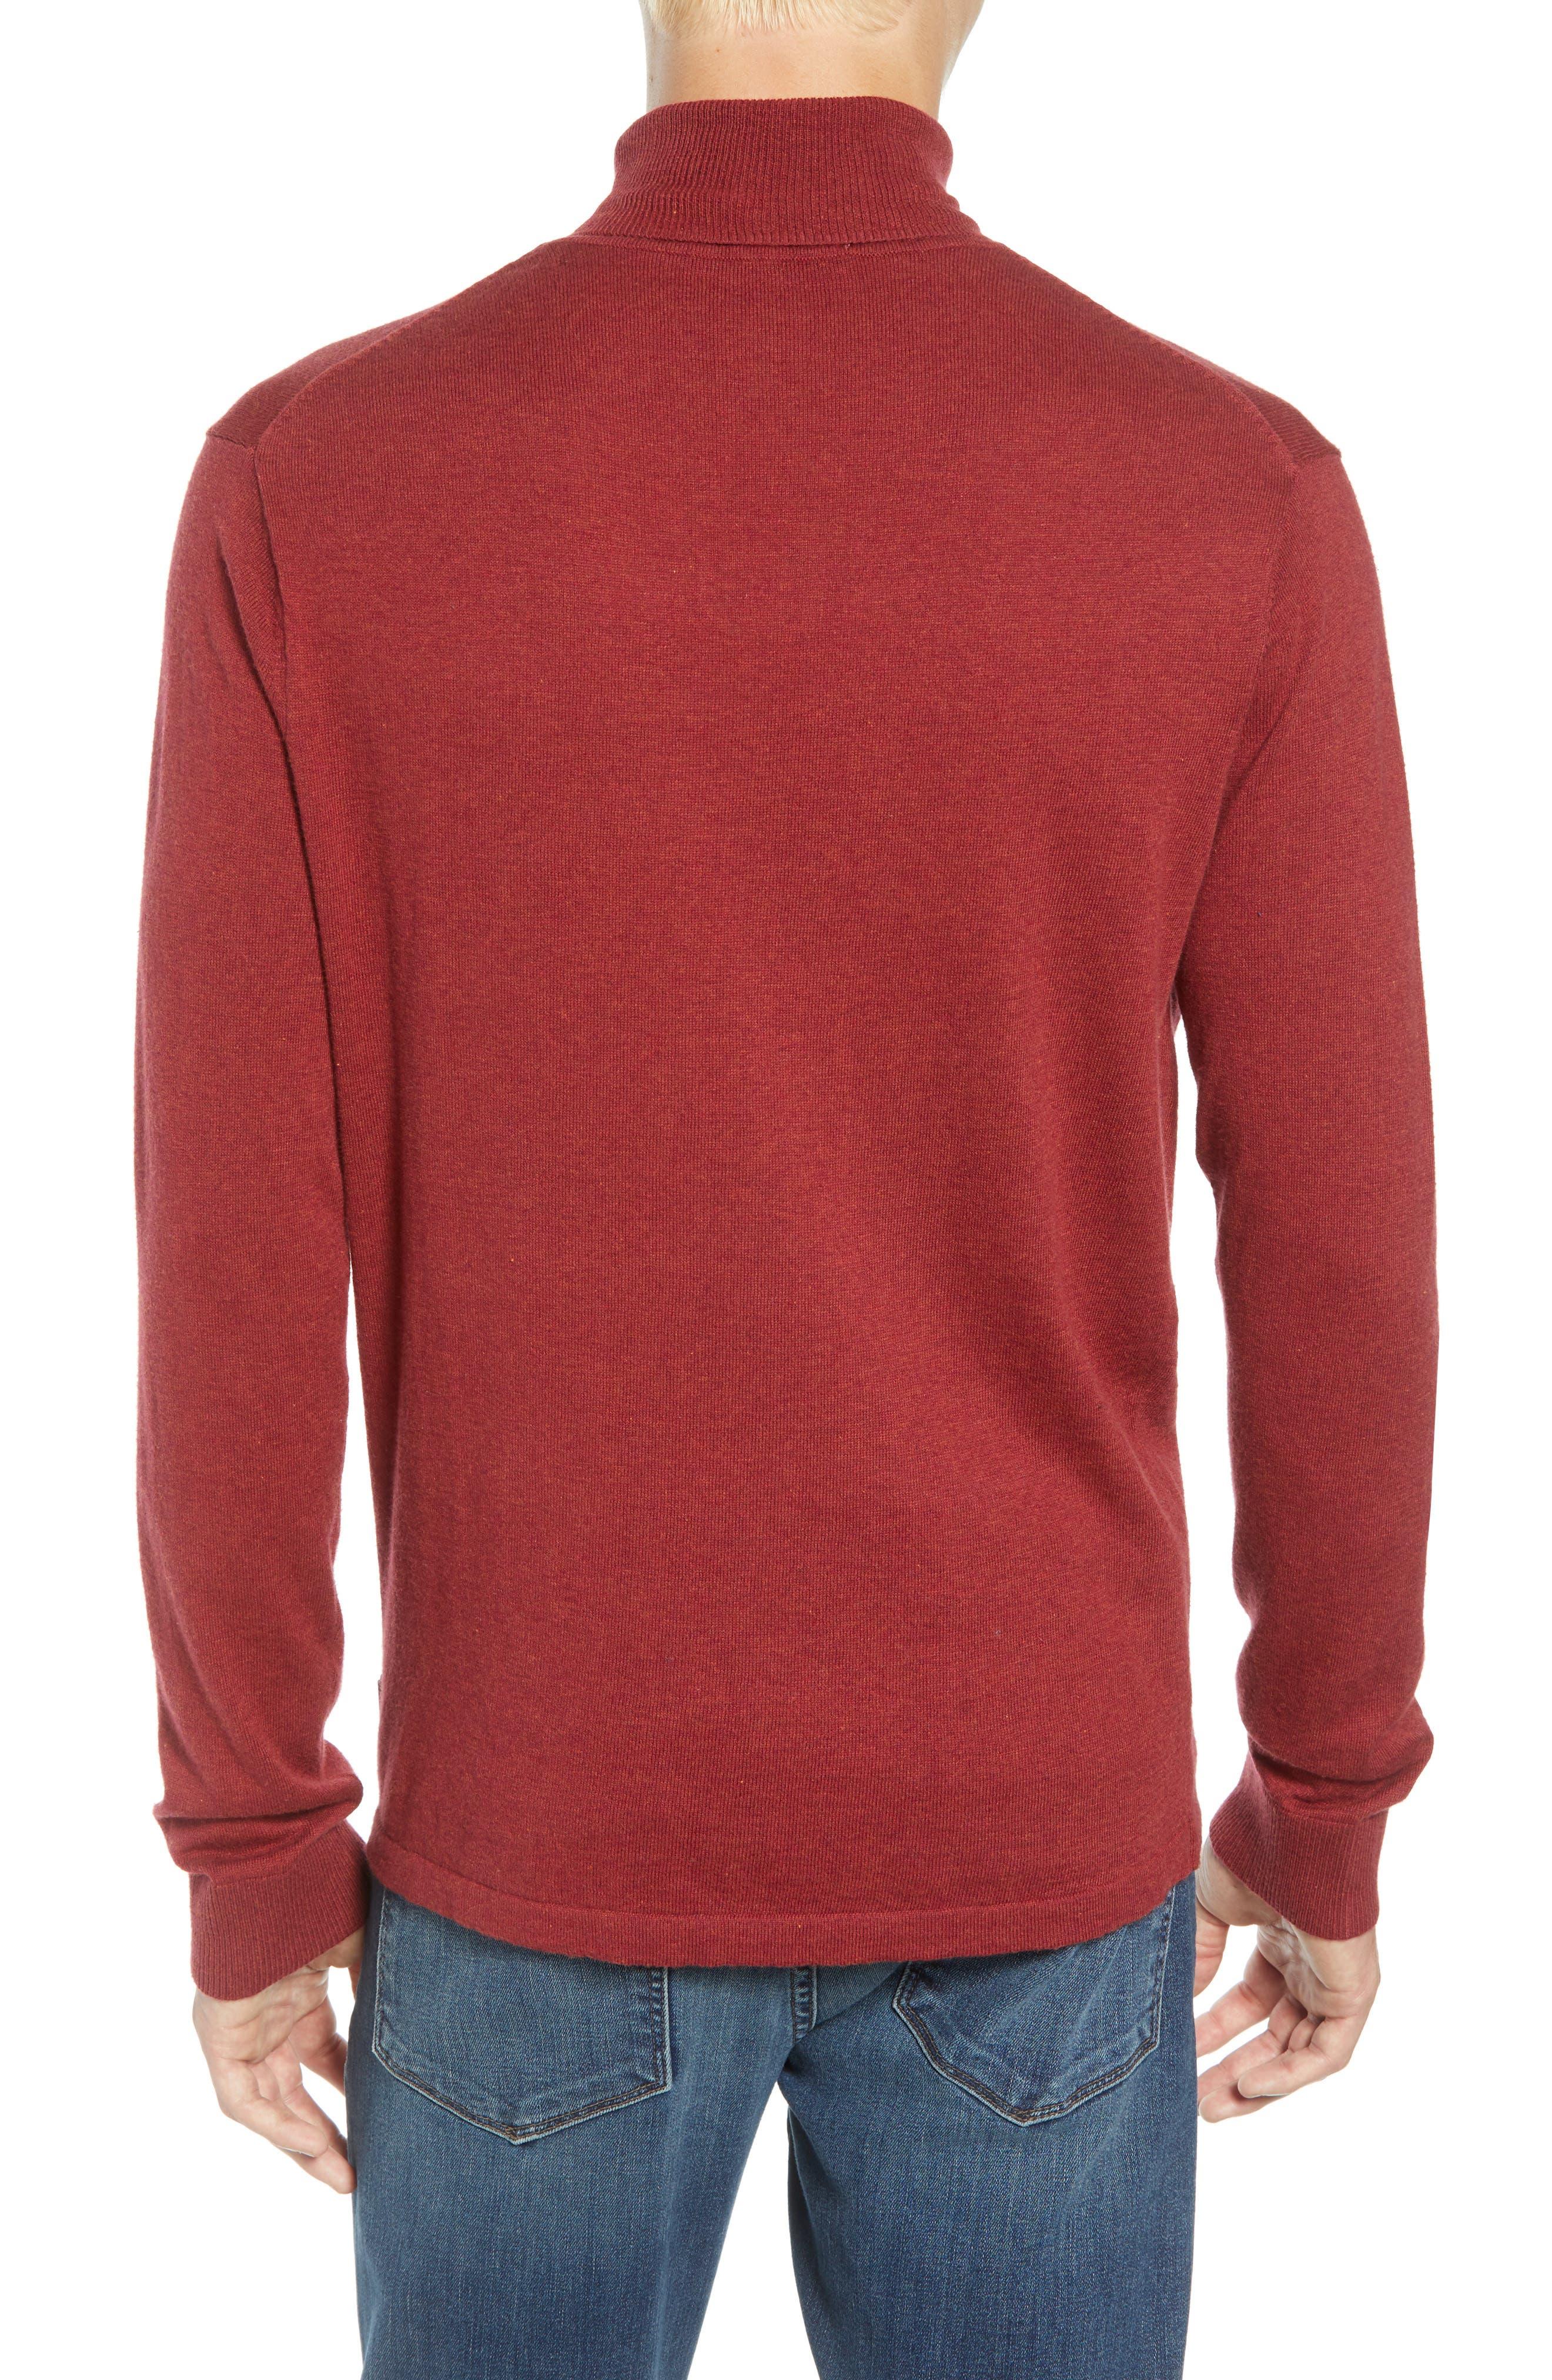 Turtleneck Sweater,                             Alternate thumbnail 2, color,                             610